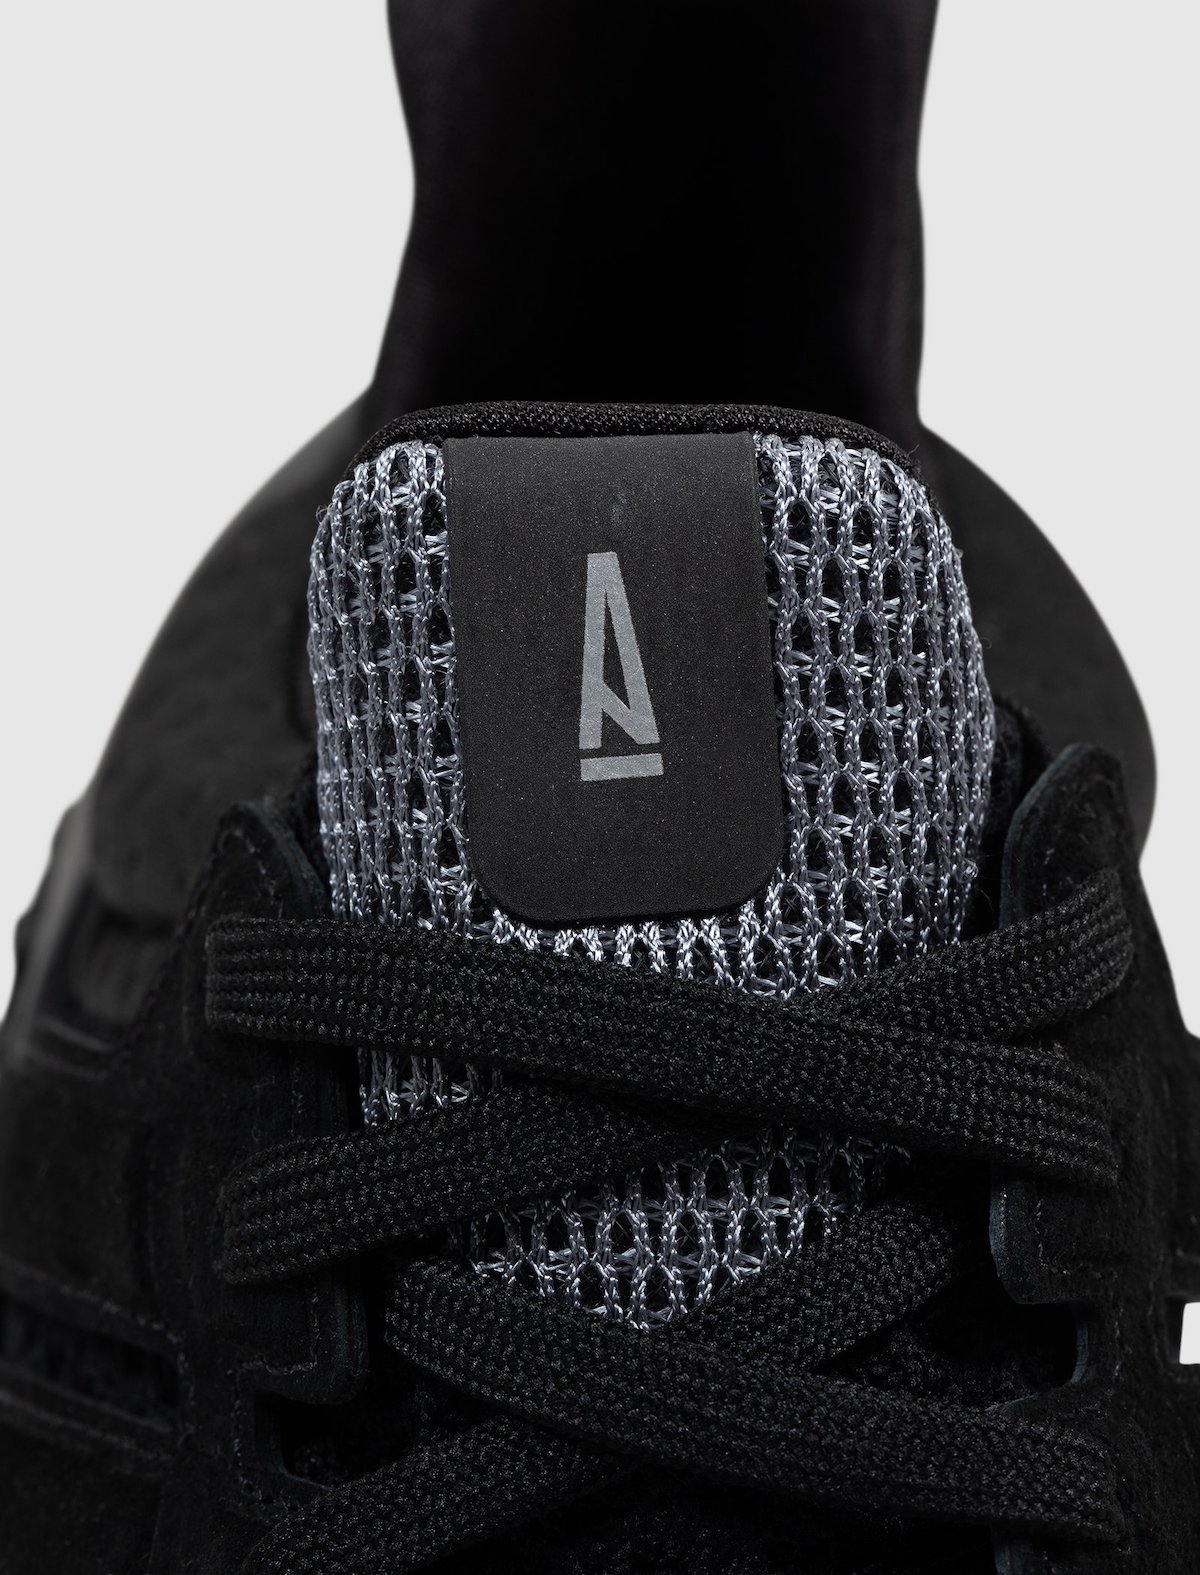 A Ma Maniere,adidas,Ultra 4D  「黑武士」装扮!全新 A Ma Maniere 联名即将发售!